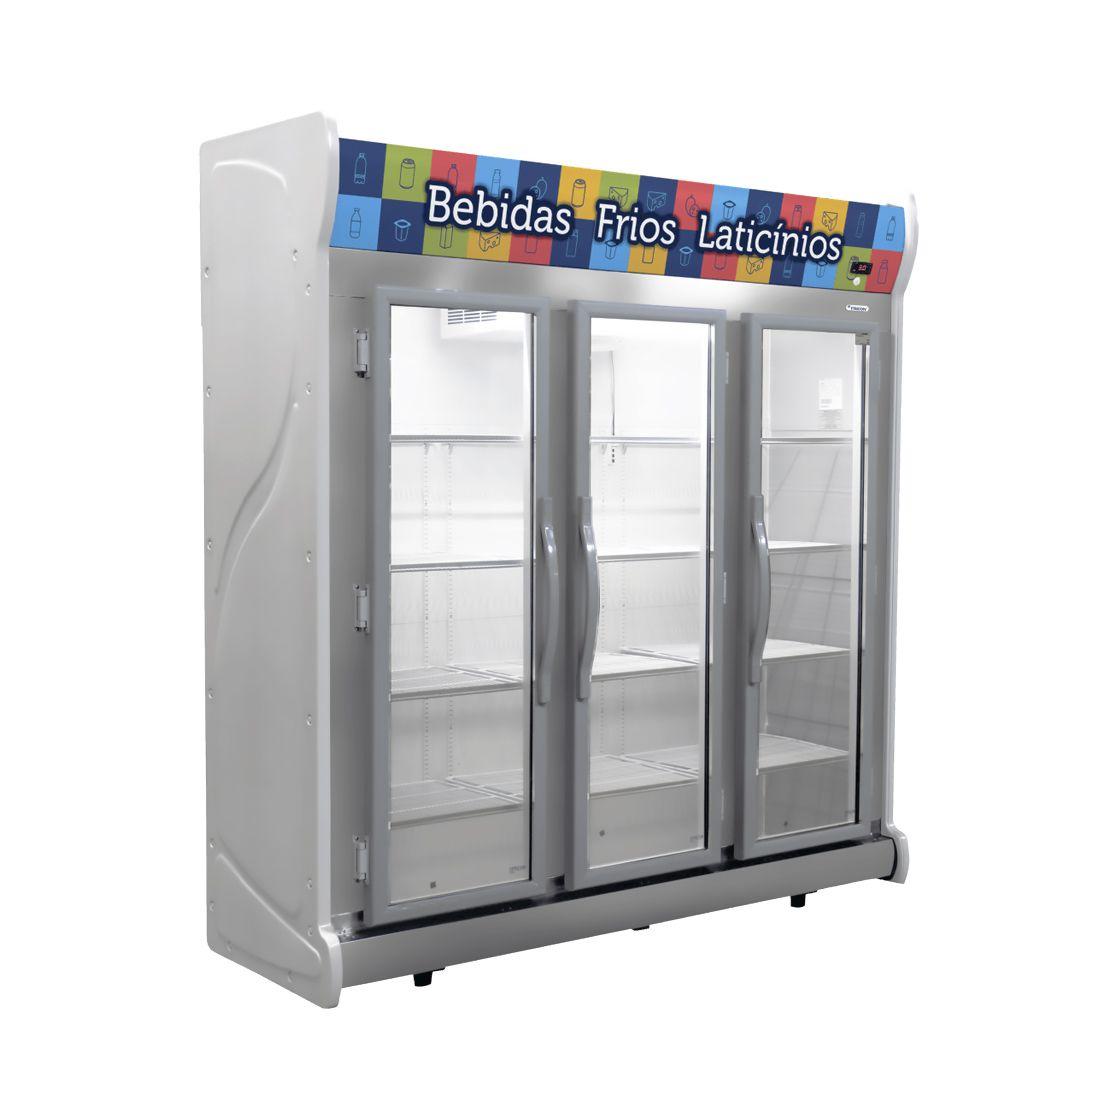 Expositor Refrigerado Auto Serviço Vertical Fricon Frost Free Cinza ACFM1450 - 220v